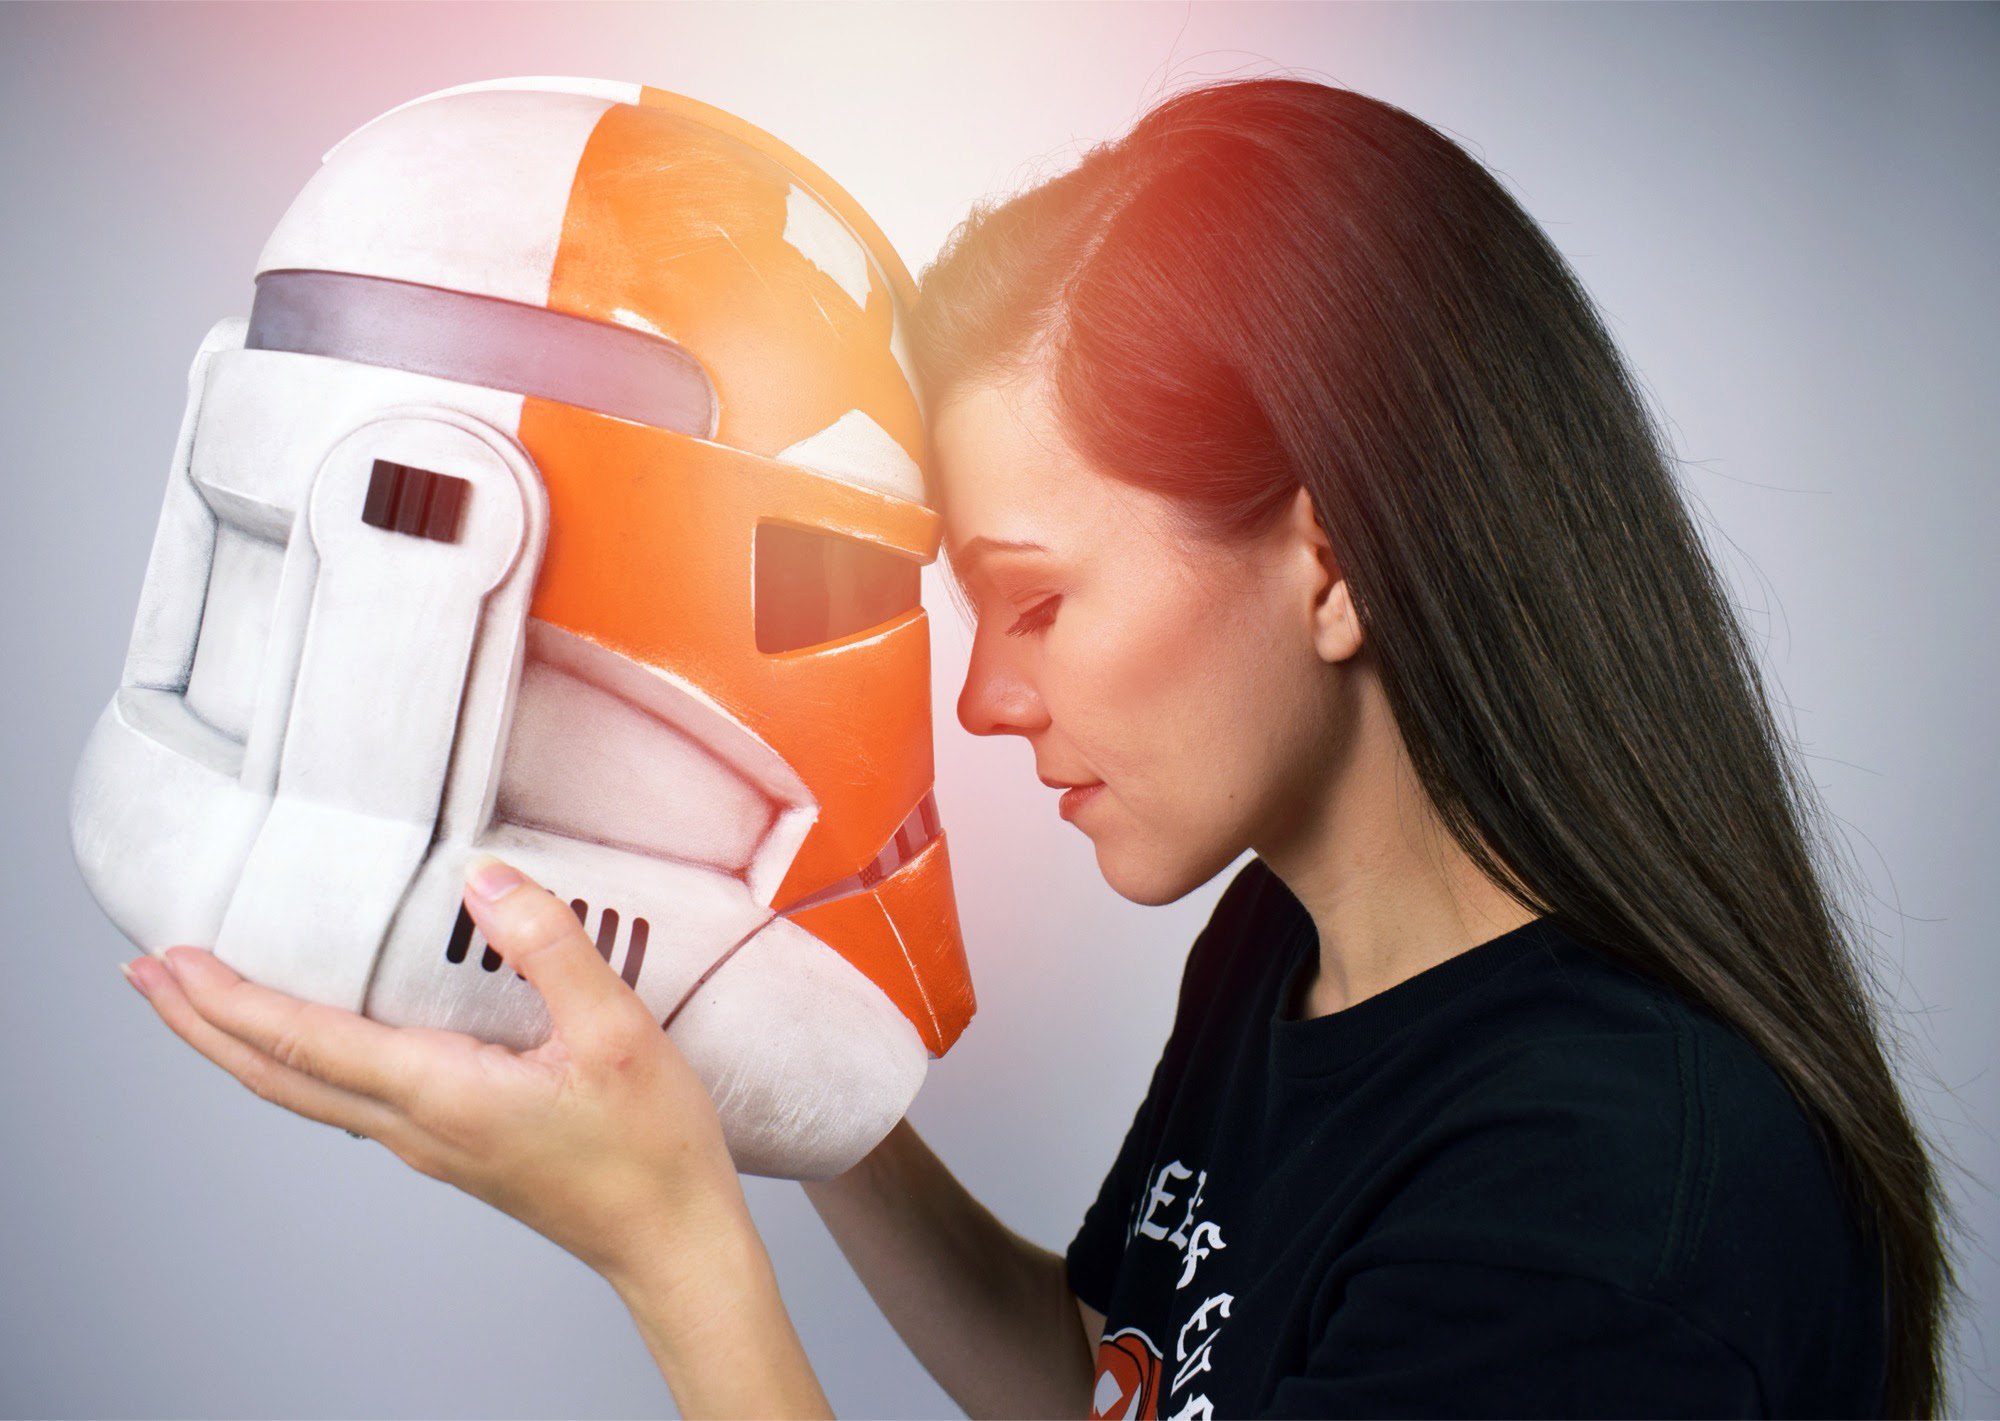 Star Wars 332nd Clone Trooper Helmet Review - SamoilovART   Anakin and His Angel